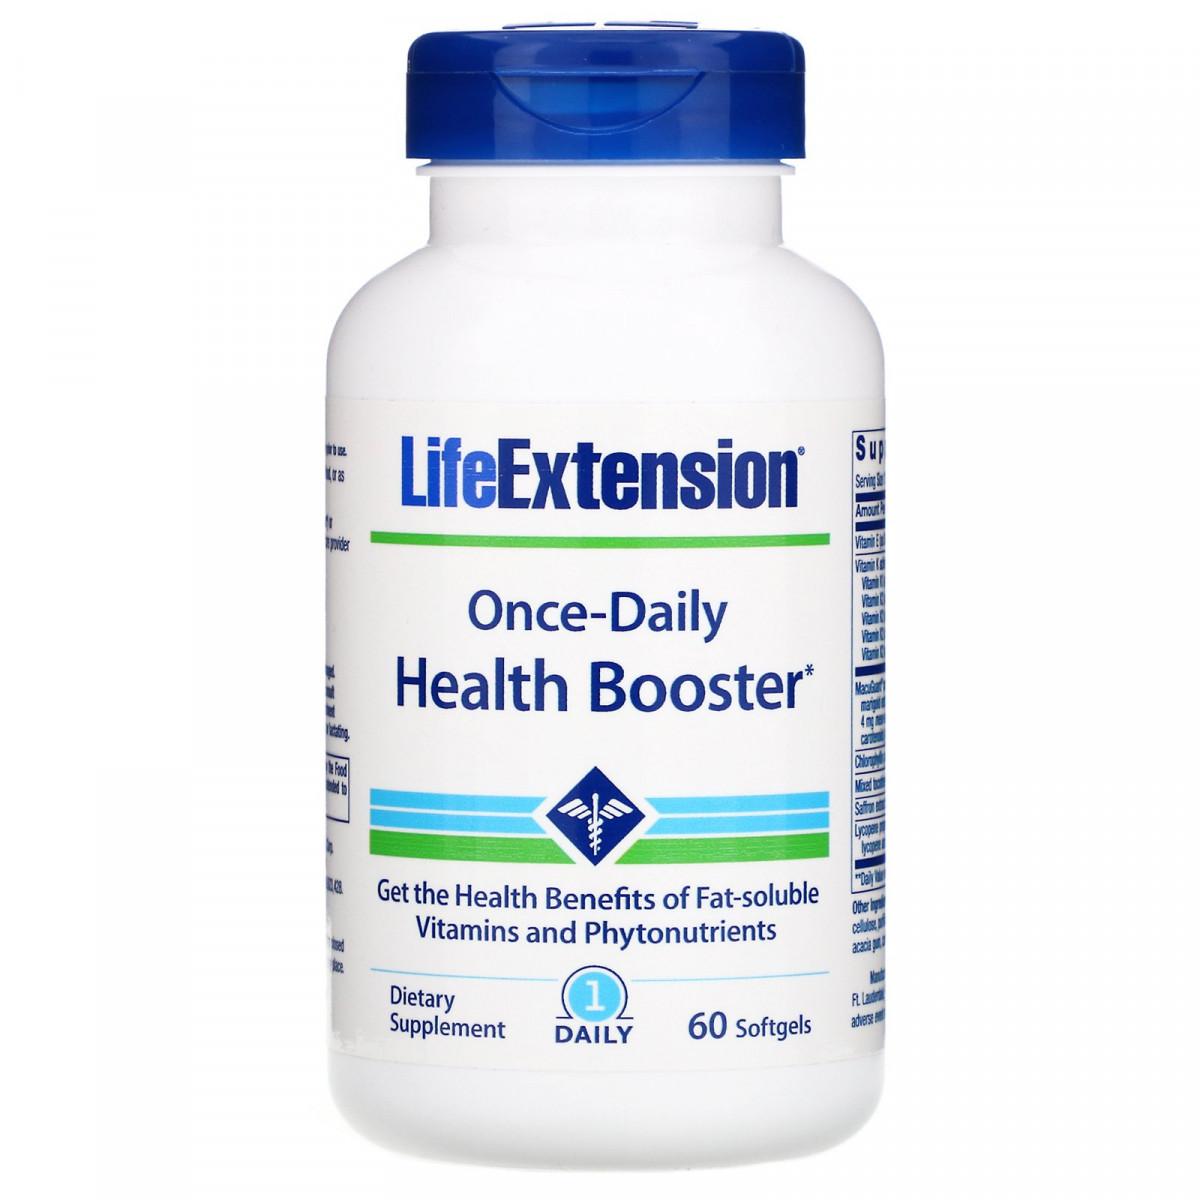 Витамины для здоровья, Once-Daily Health Booster, Life Extension, 60 мягких капсул